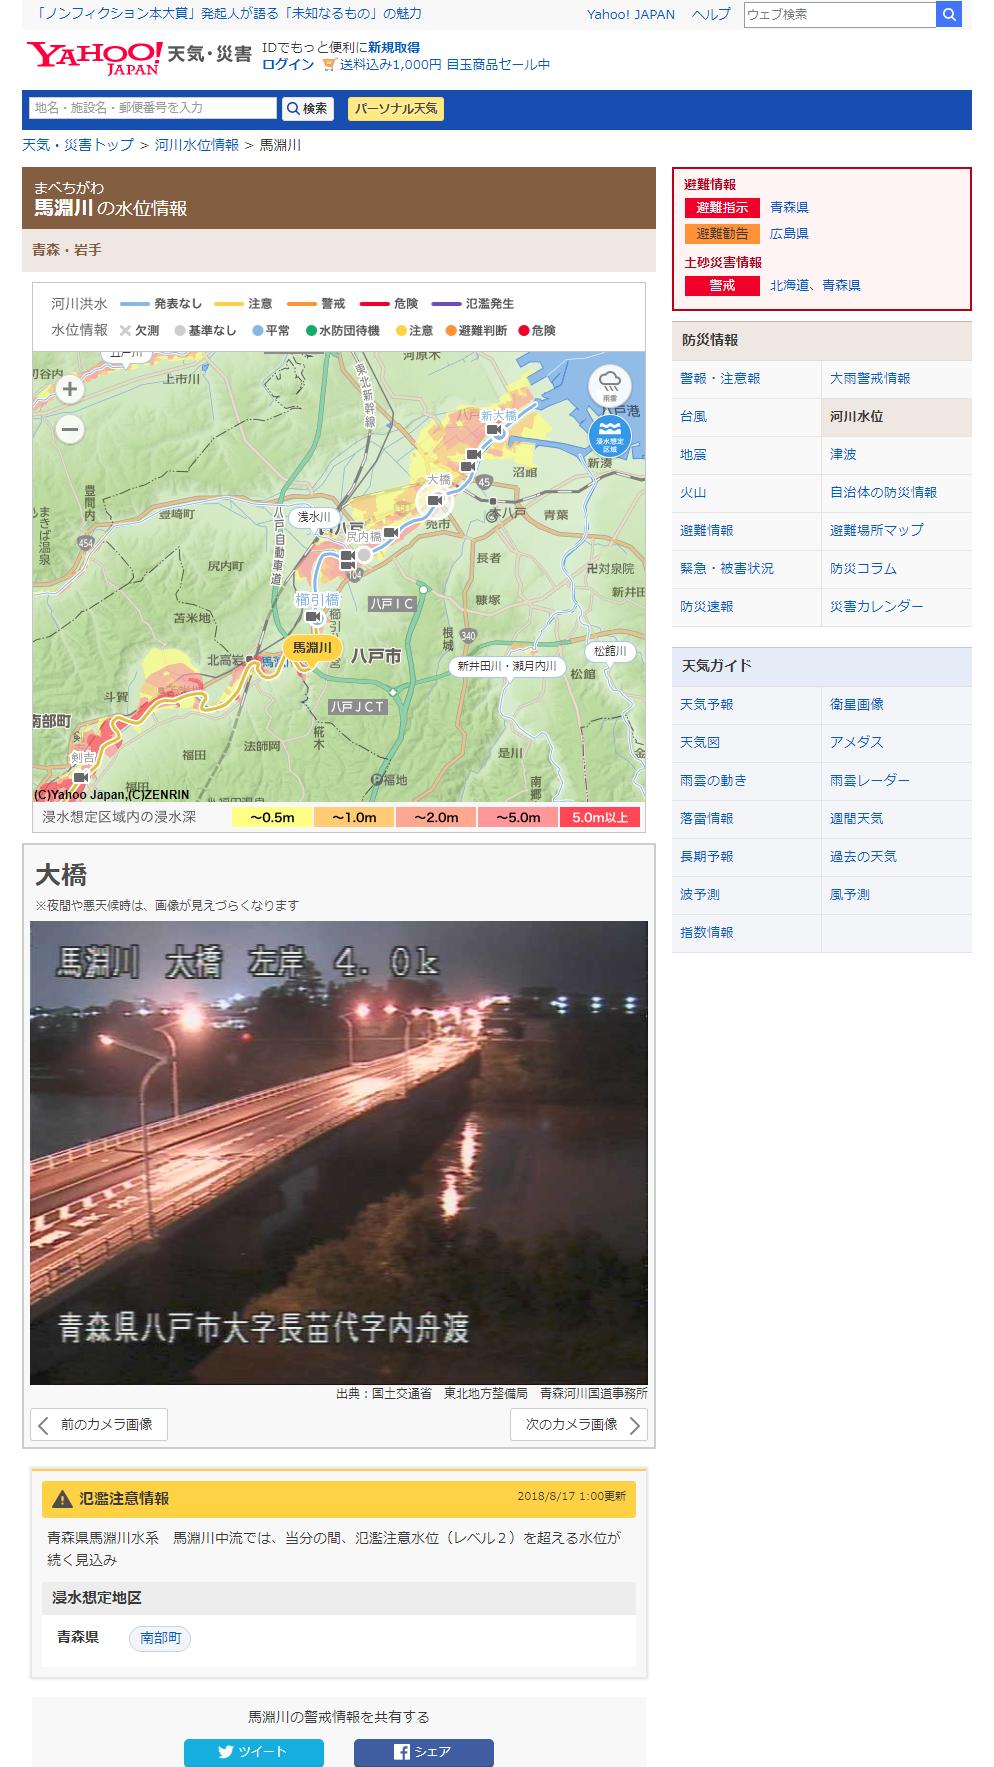 「Yahoo!天気・災害」の「河川水位情報」の例(青森県の馬淵川)